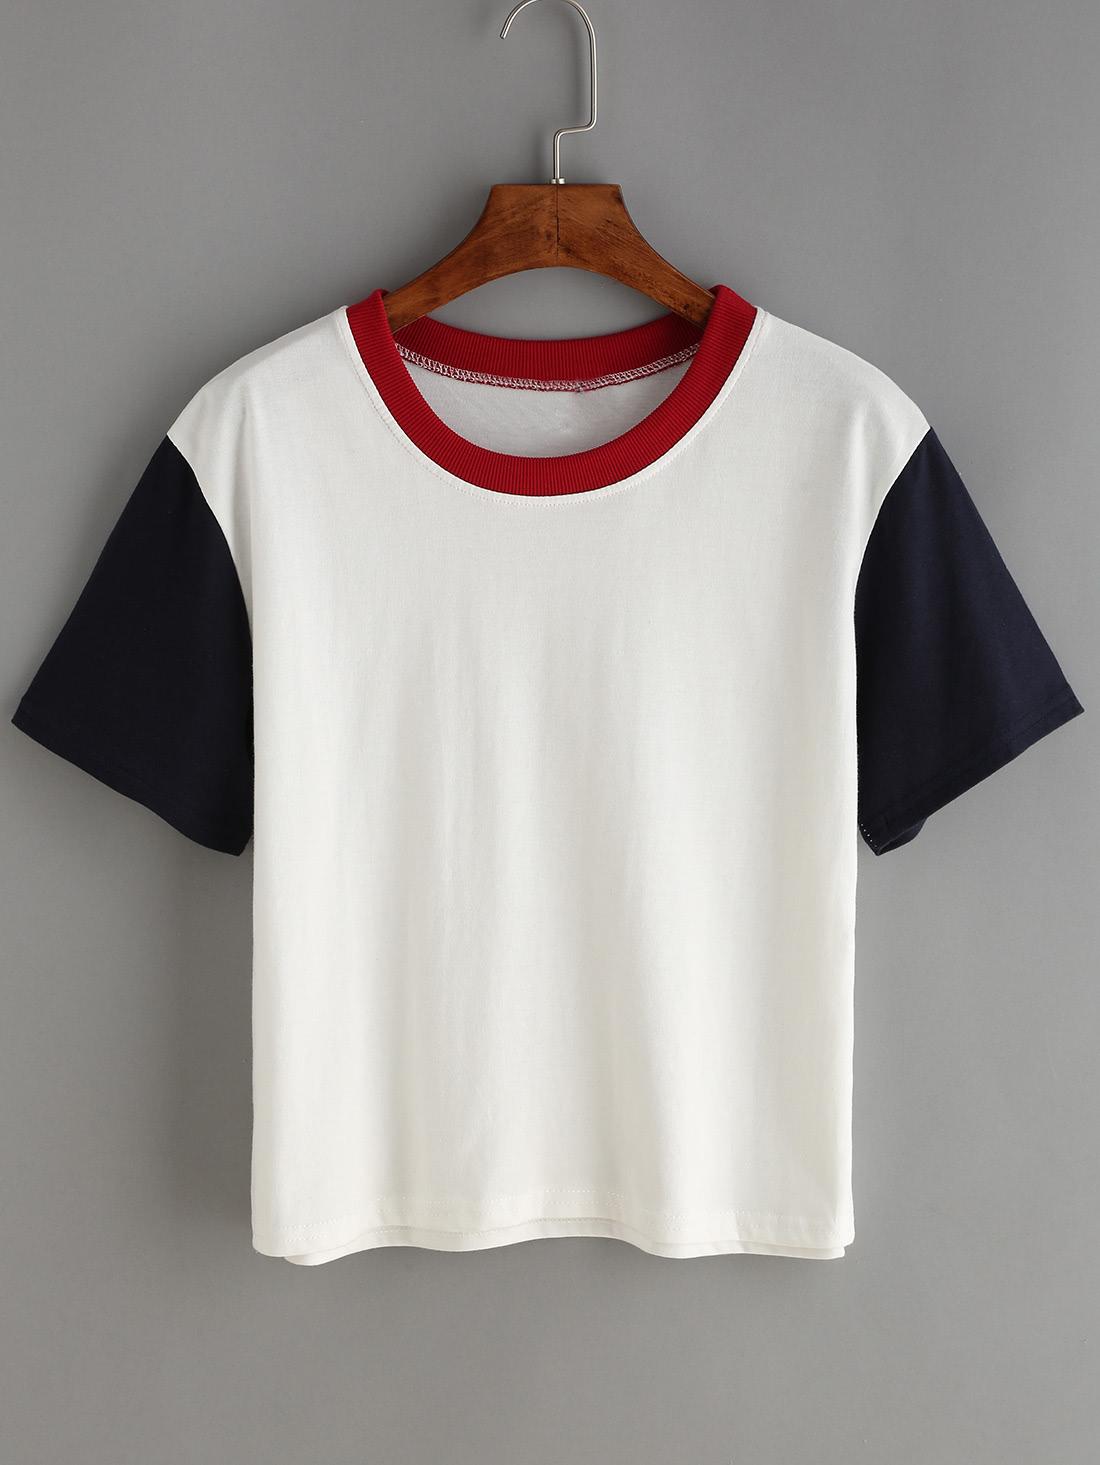 Contrast Crew Neck White T Shirt